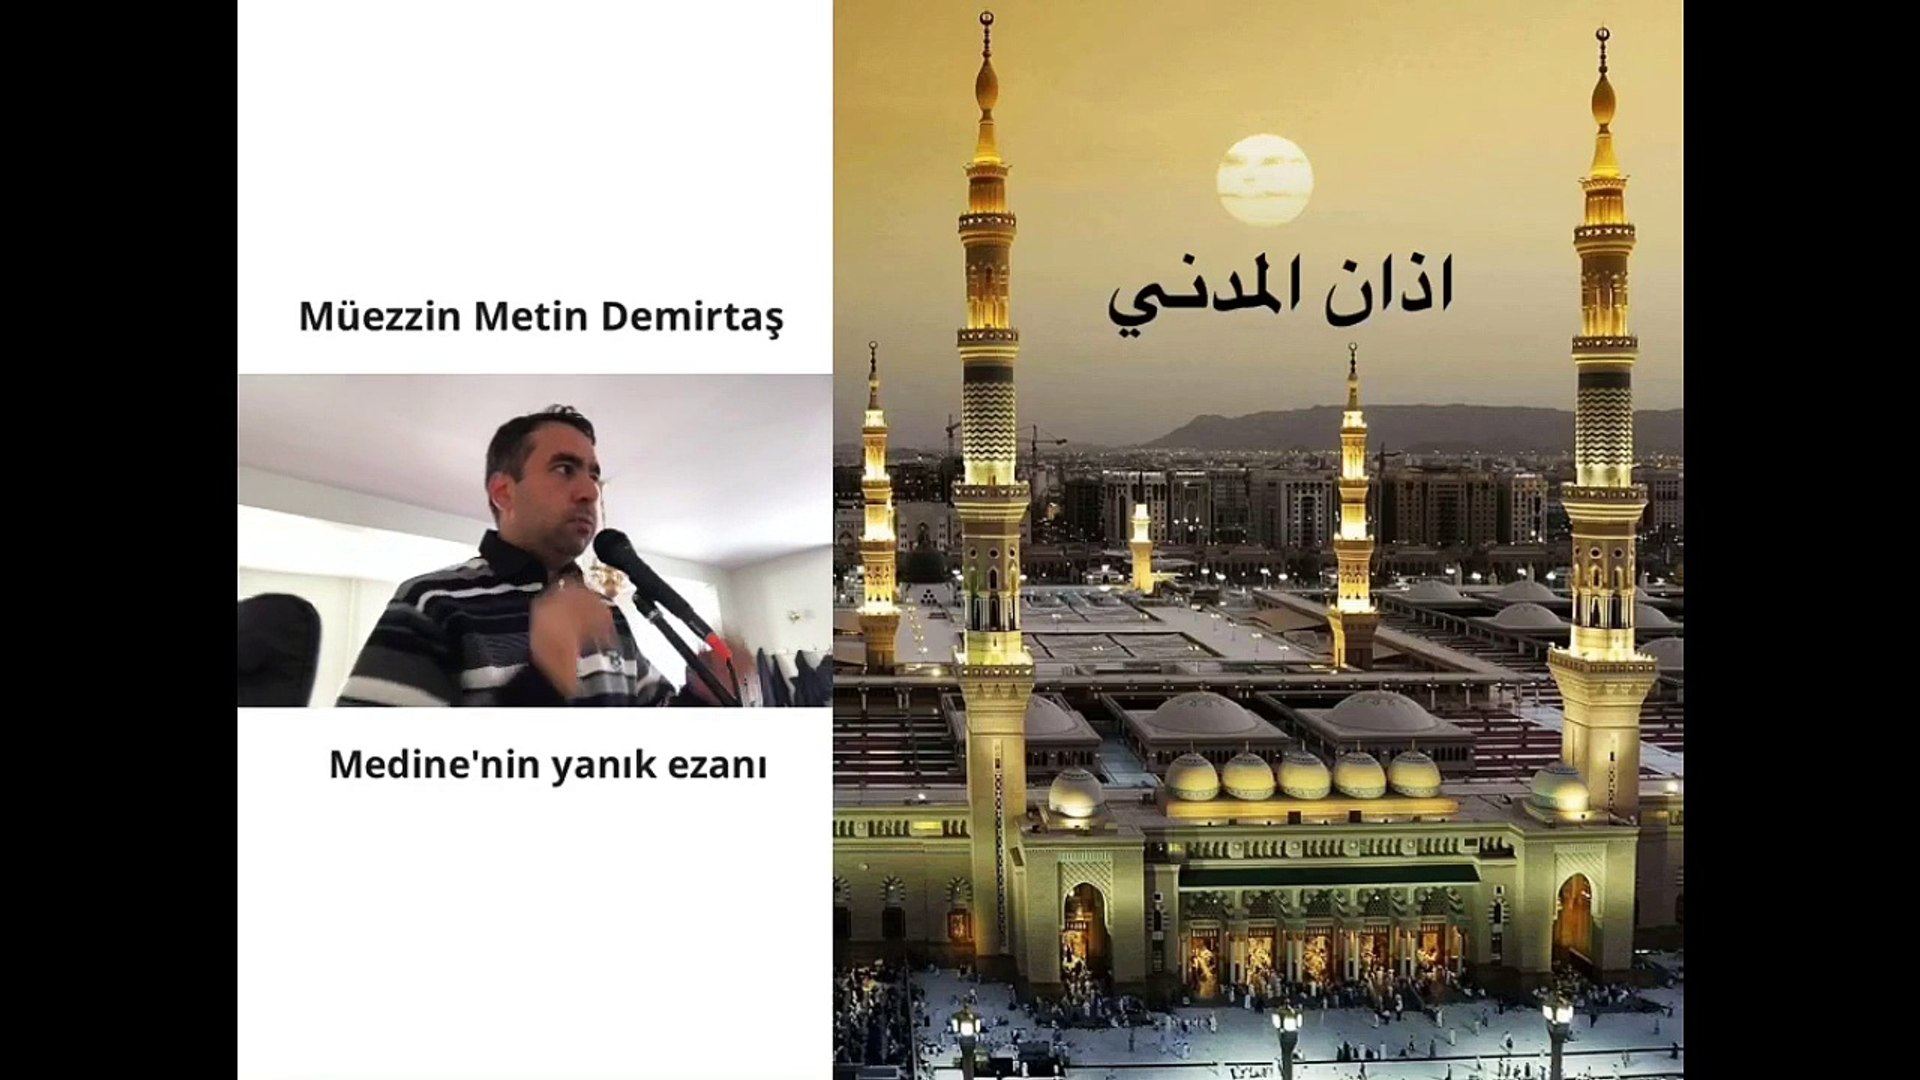 Arap makami ezan hafiz Metin Demirtas. MEDINE MAKAMI EZAN. Medine makaminda ezan. Medine makami Maqa